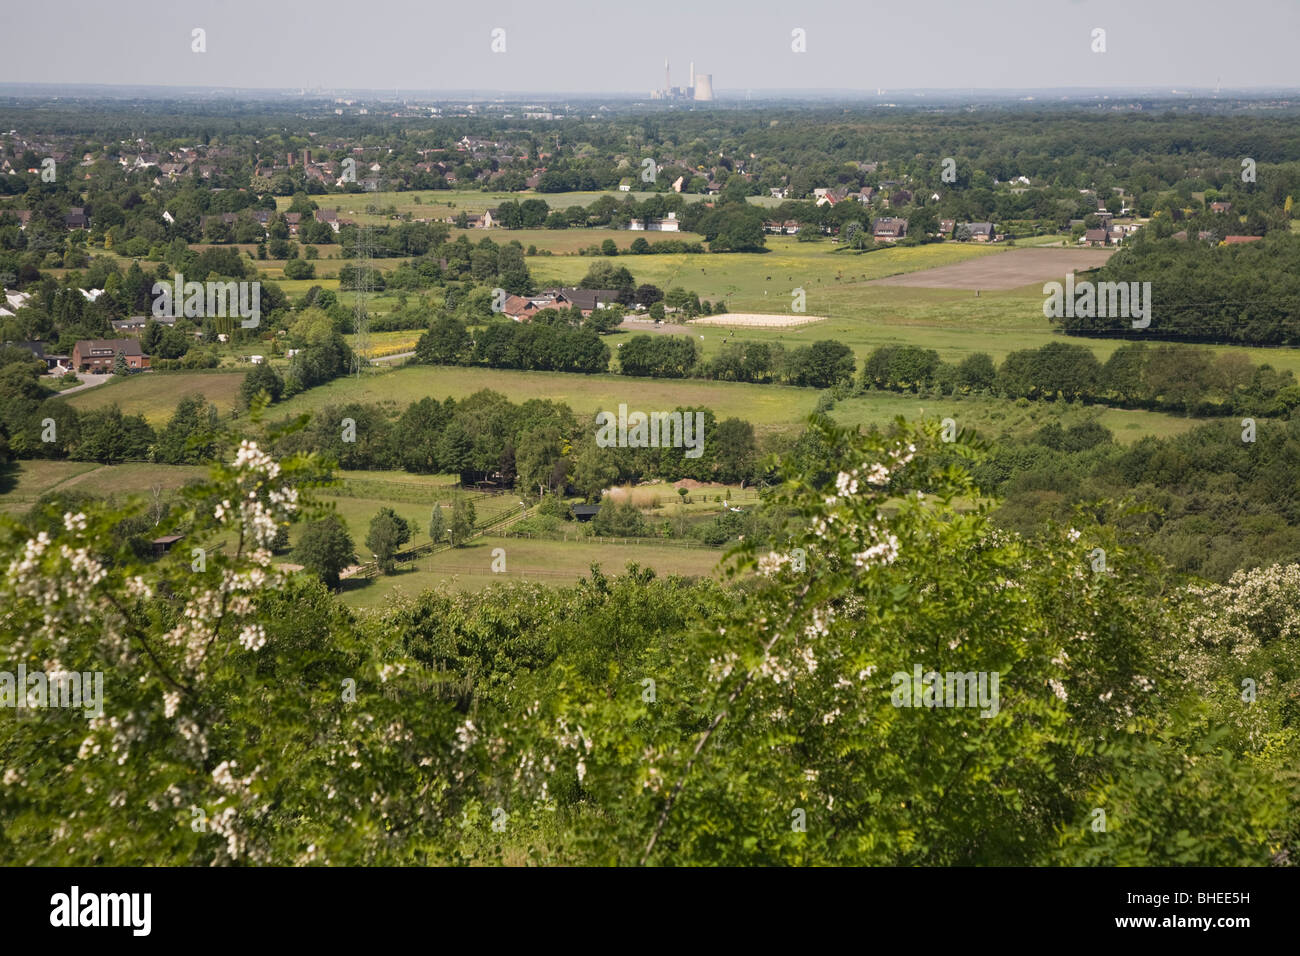 view from Halde Haniel, Bottrop, Germany - Stock Image